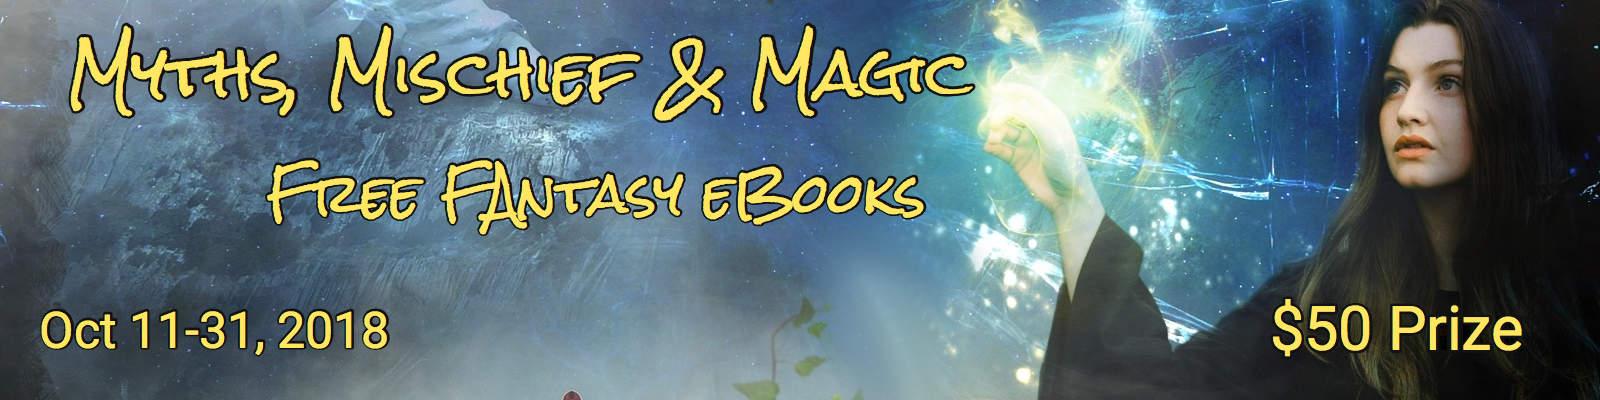 Myths, Mischief, and Magic: Free Fantasy E-books